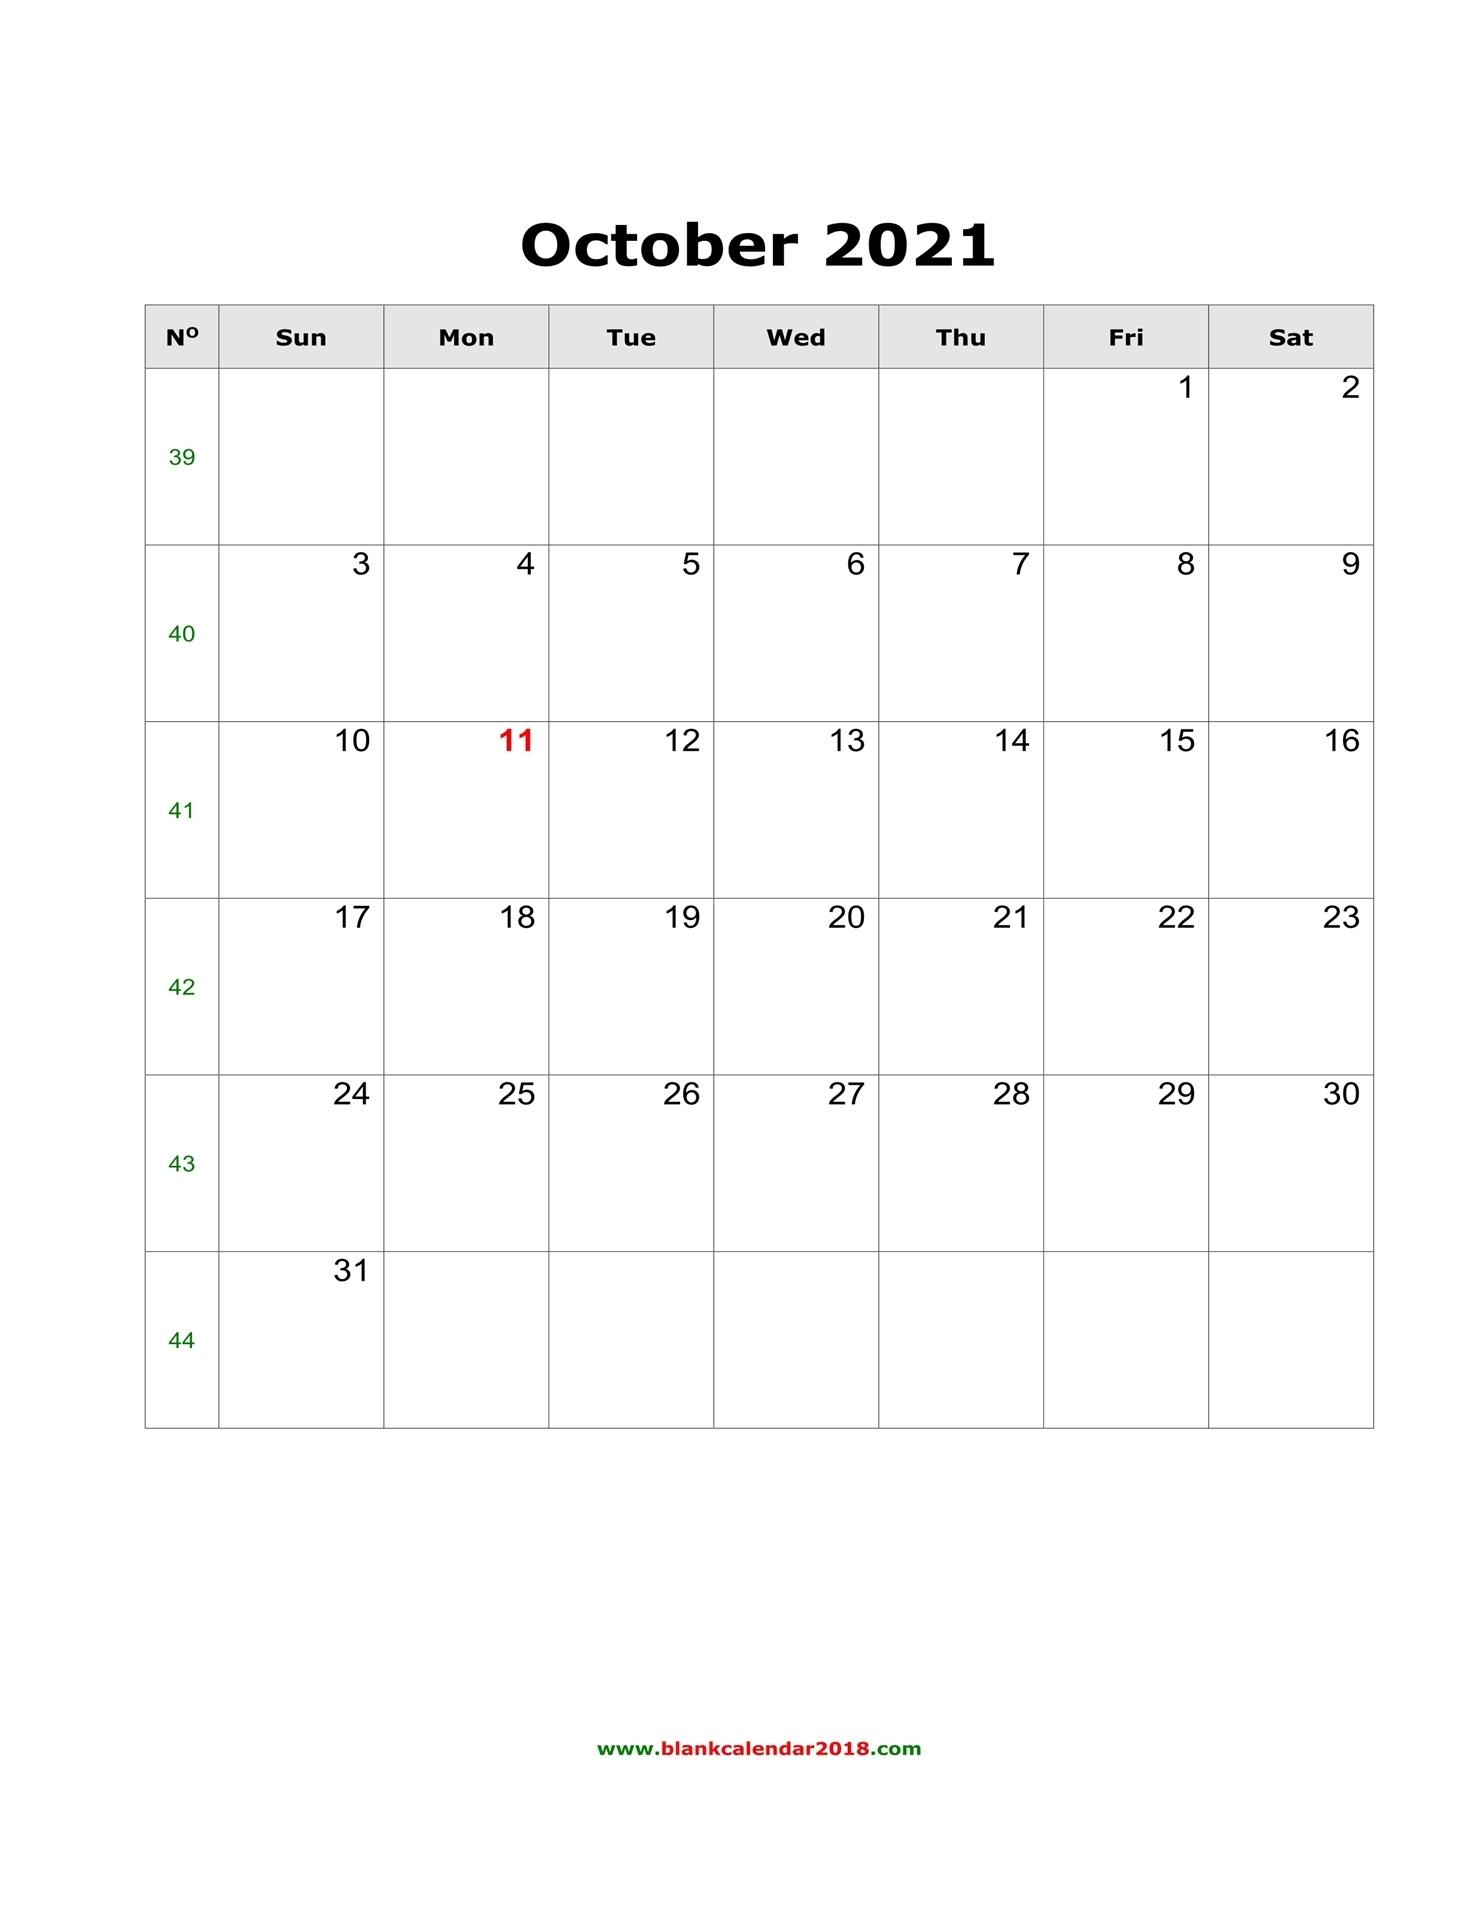 Blank Calendar For October 2021 October 2021 Chinese Calendar